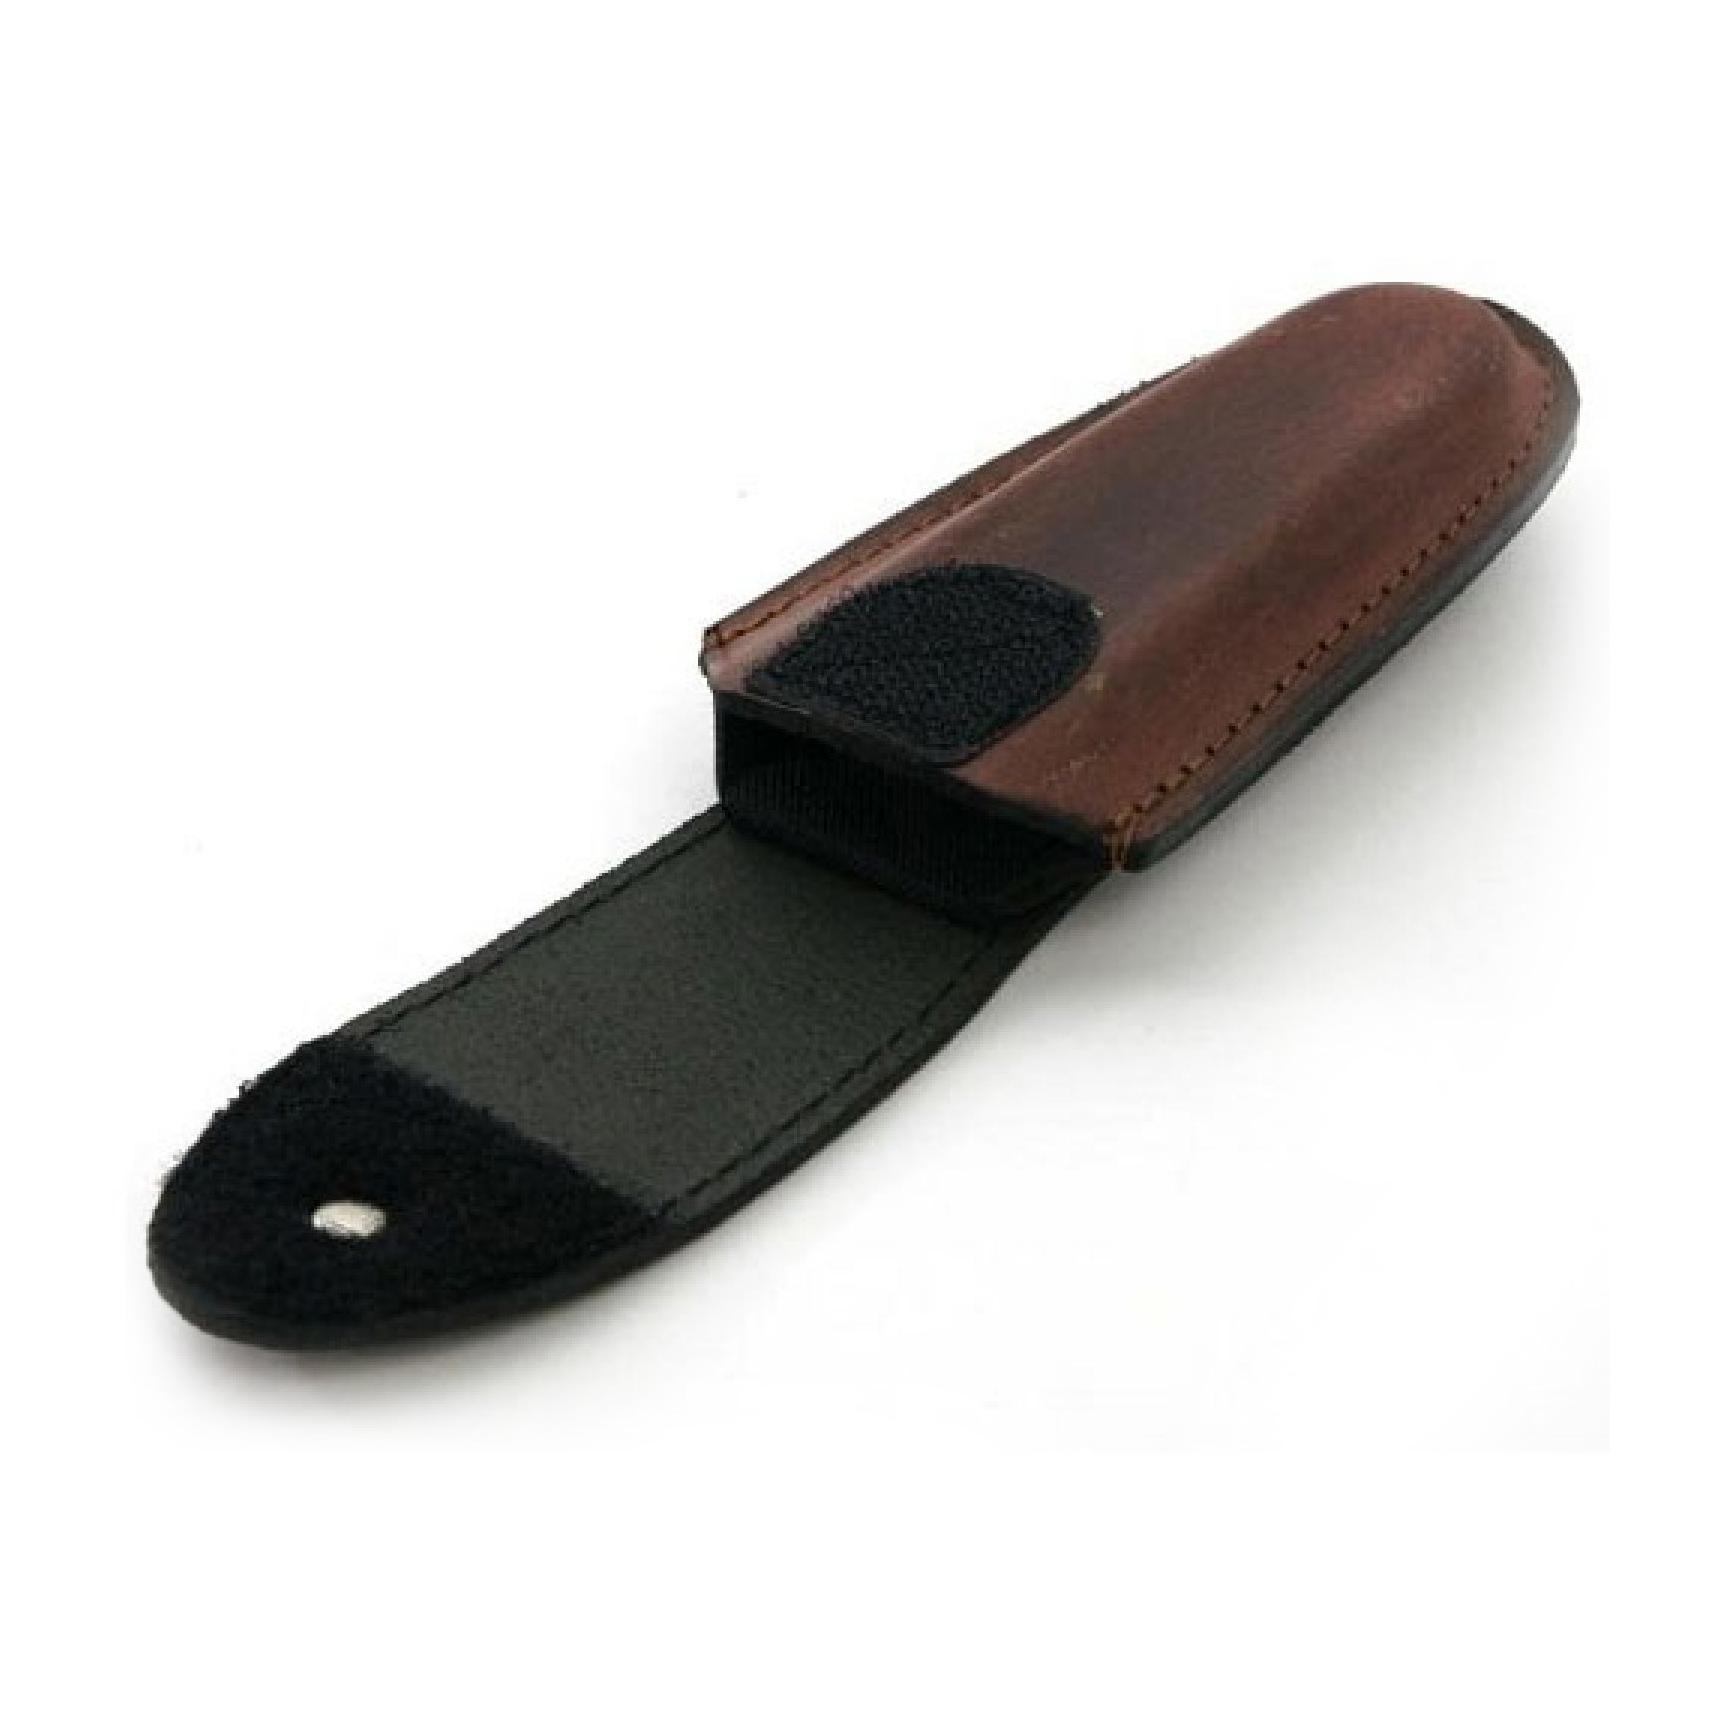 Фото 6 - Чехол для ножа Victorinox Leather Belt Pouch, коричневый